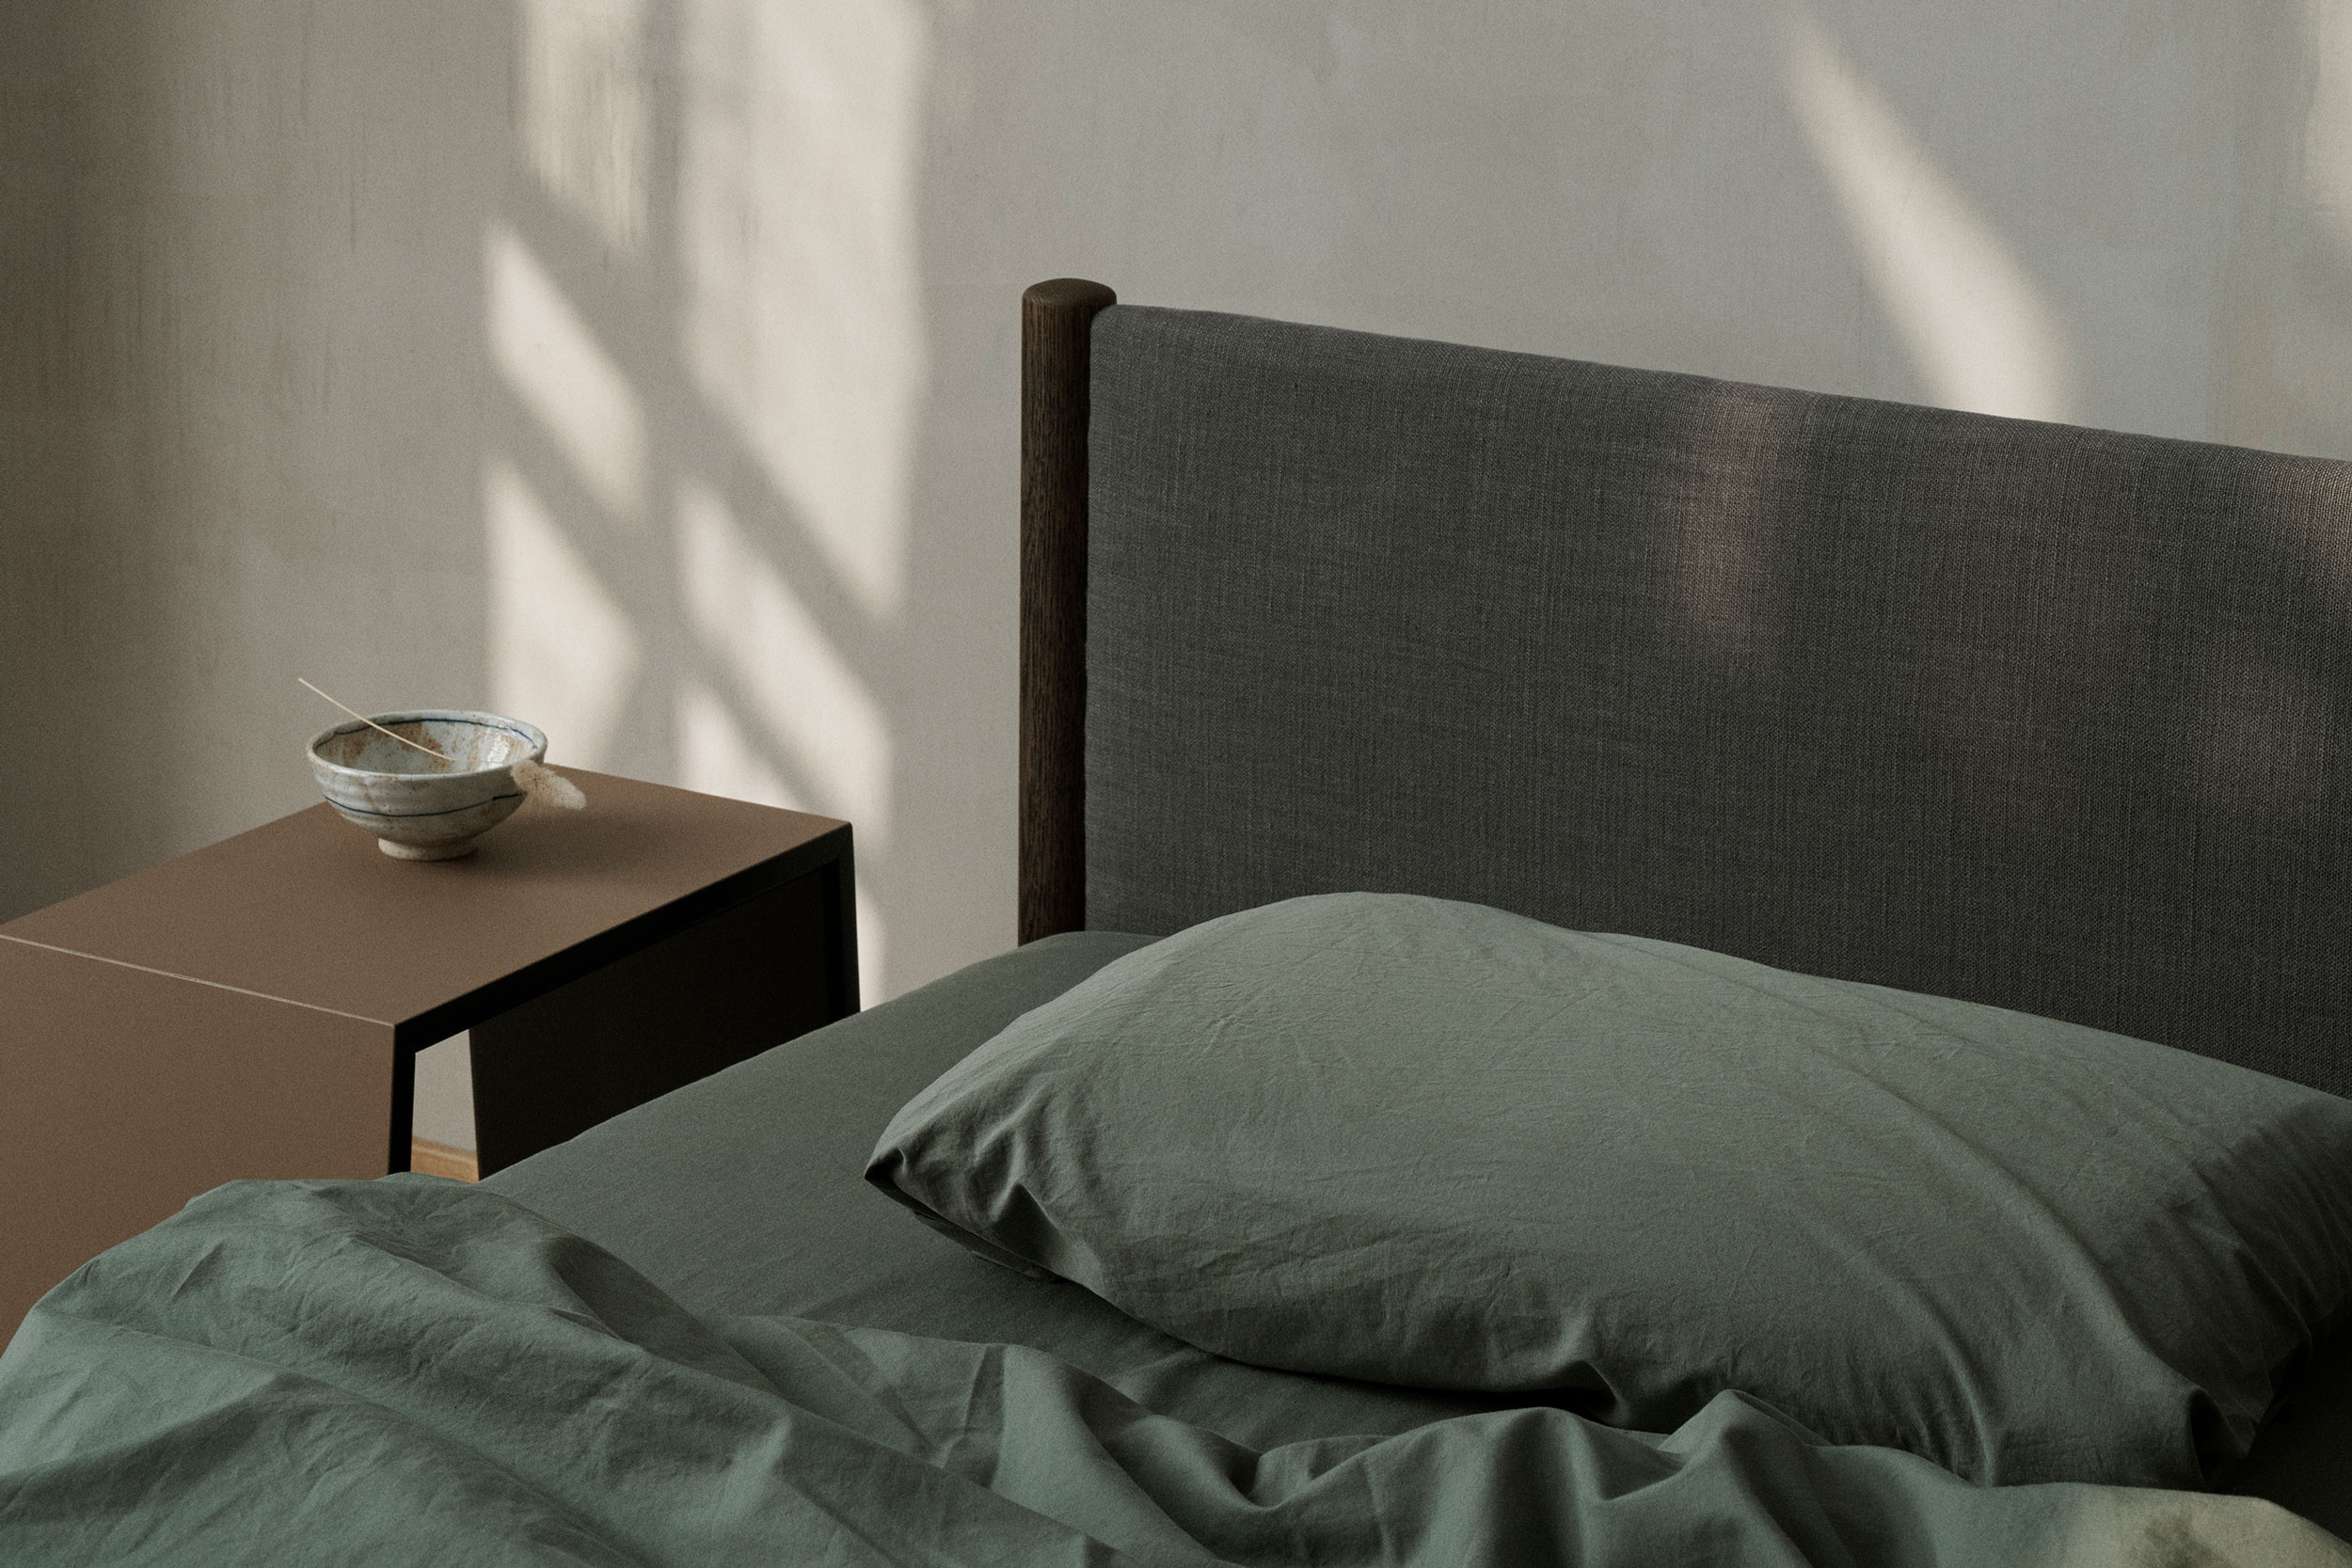 024-VENG-BED-AT-THE-LAB-RE-BEDS-DESIGN-BY-OLIVER-&-LUKAS-WEISSKROGH.jpg